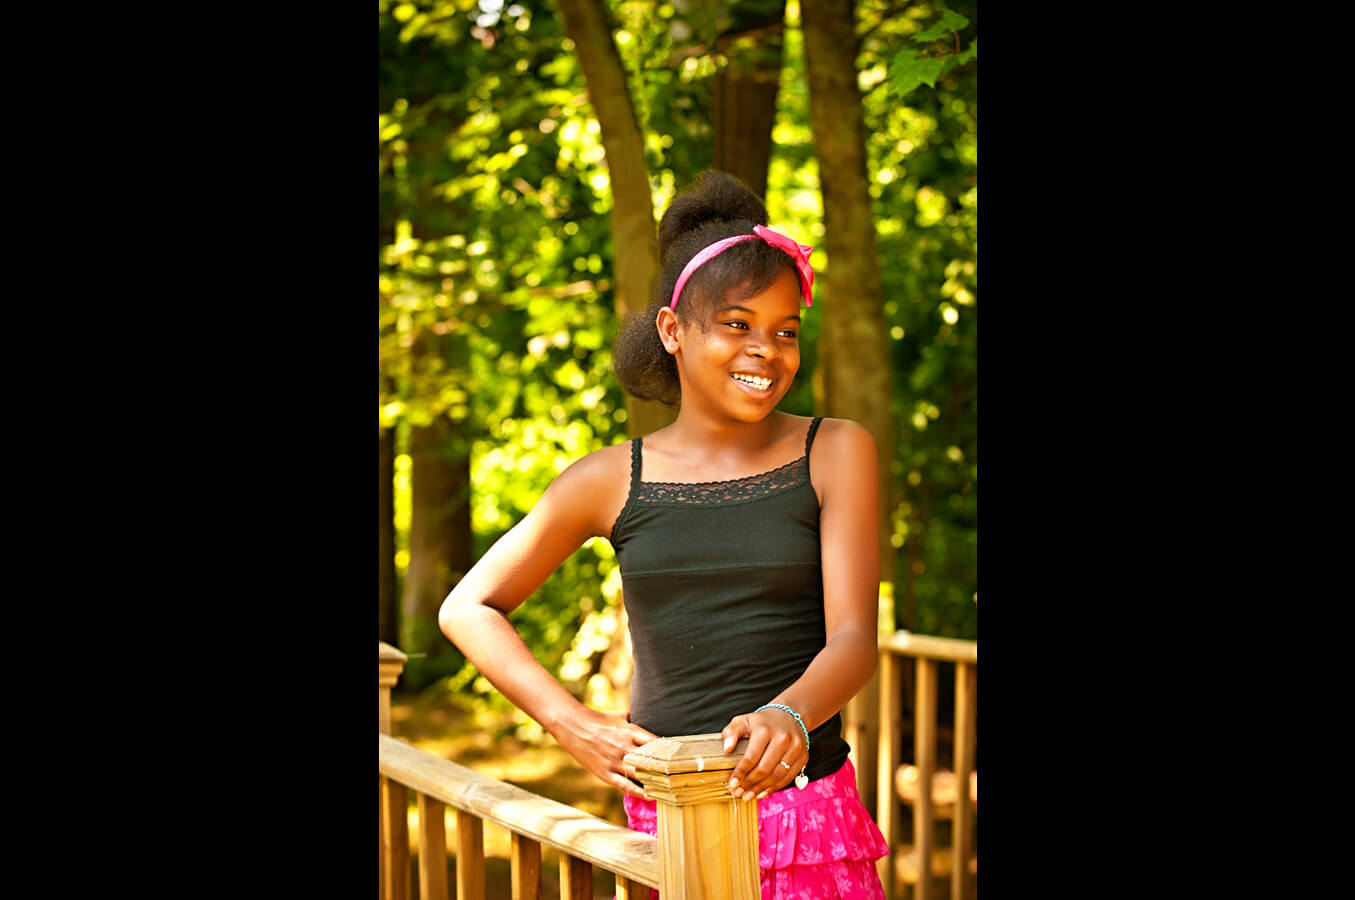 child, portrait, outdoor, bridge, natural light, Northern VA